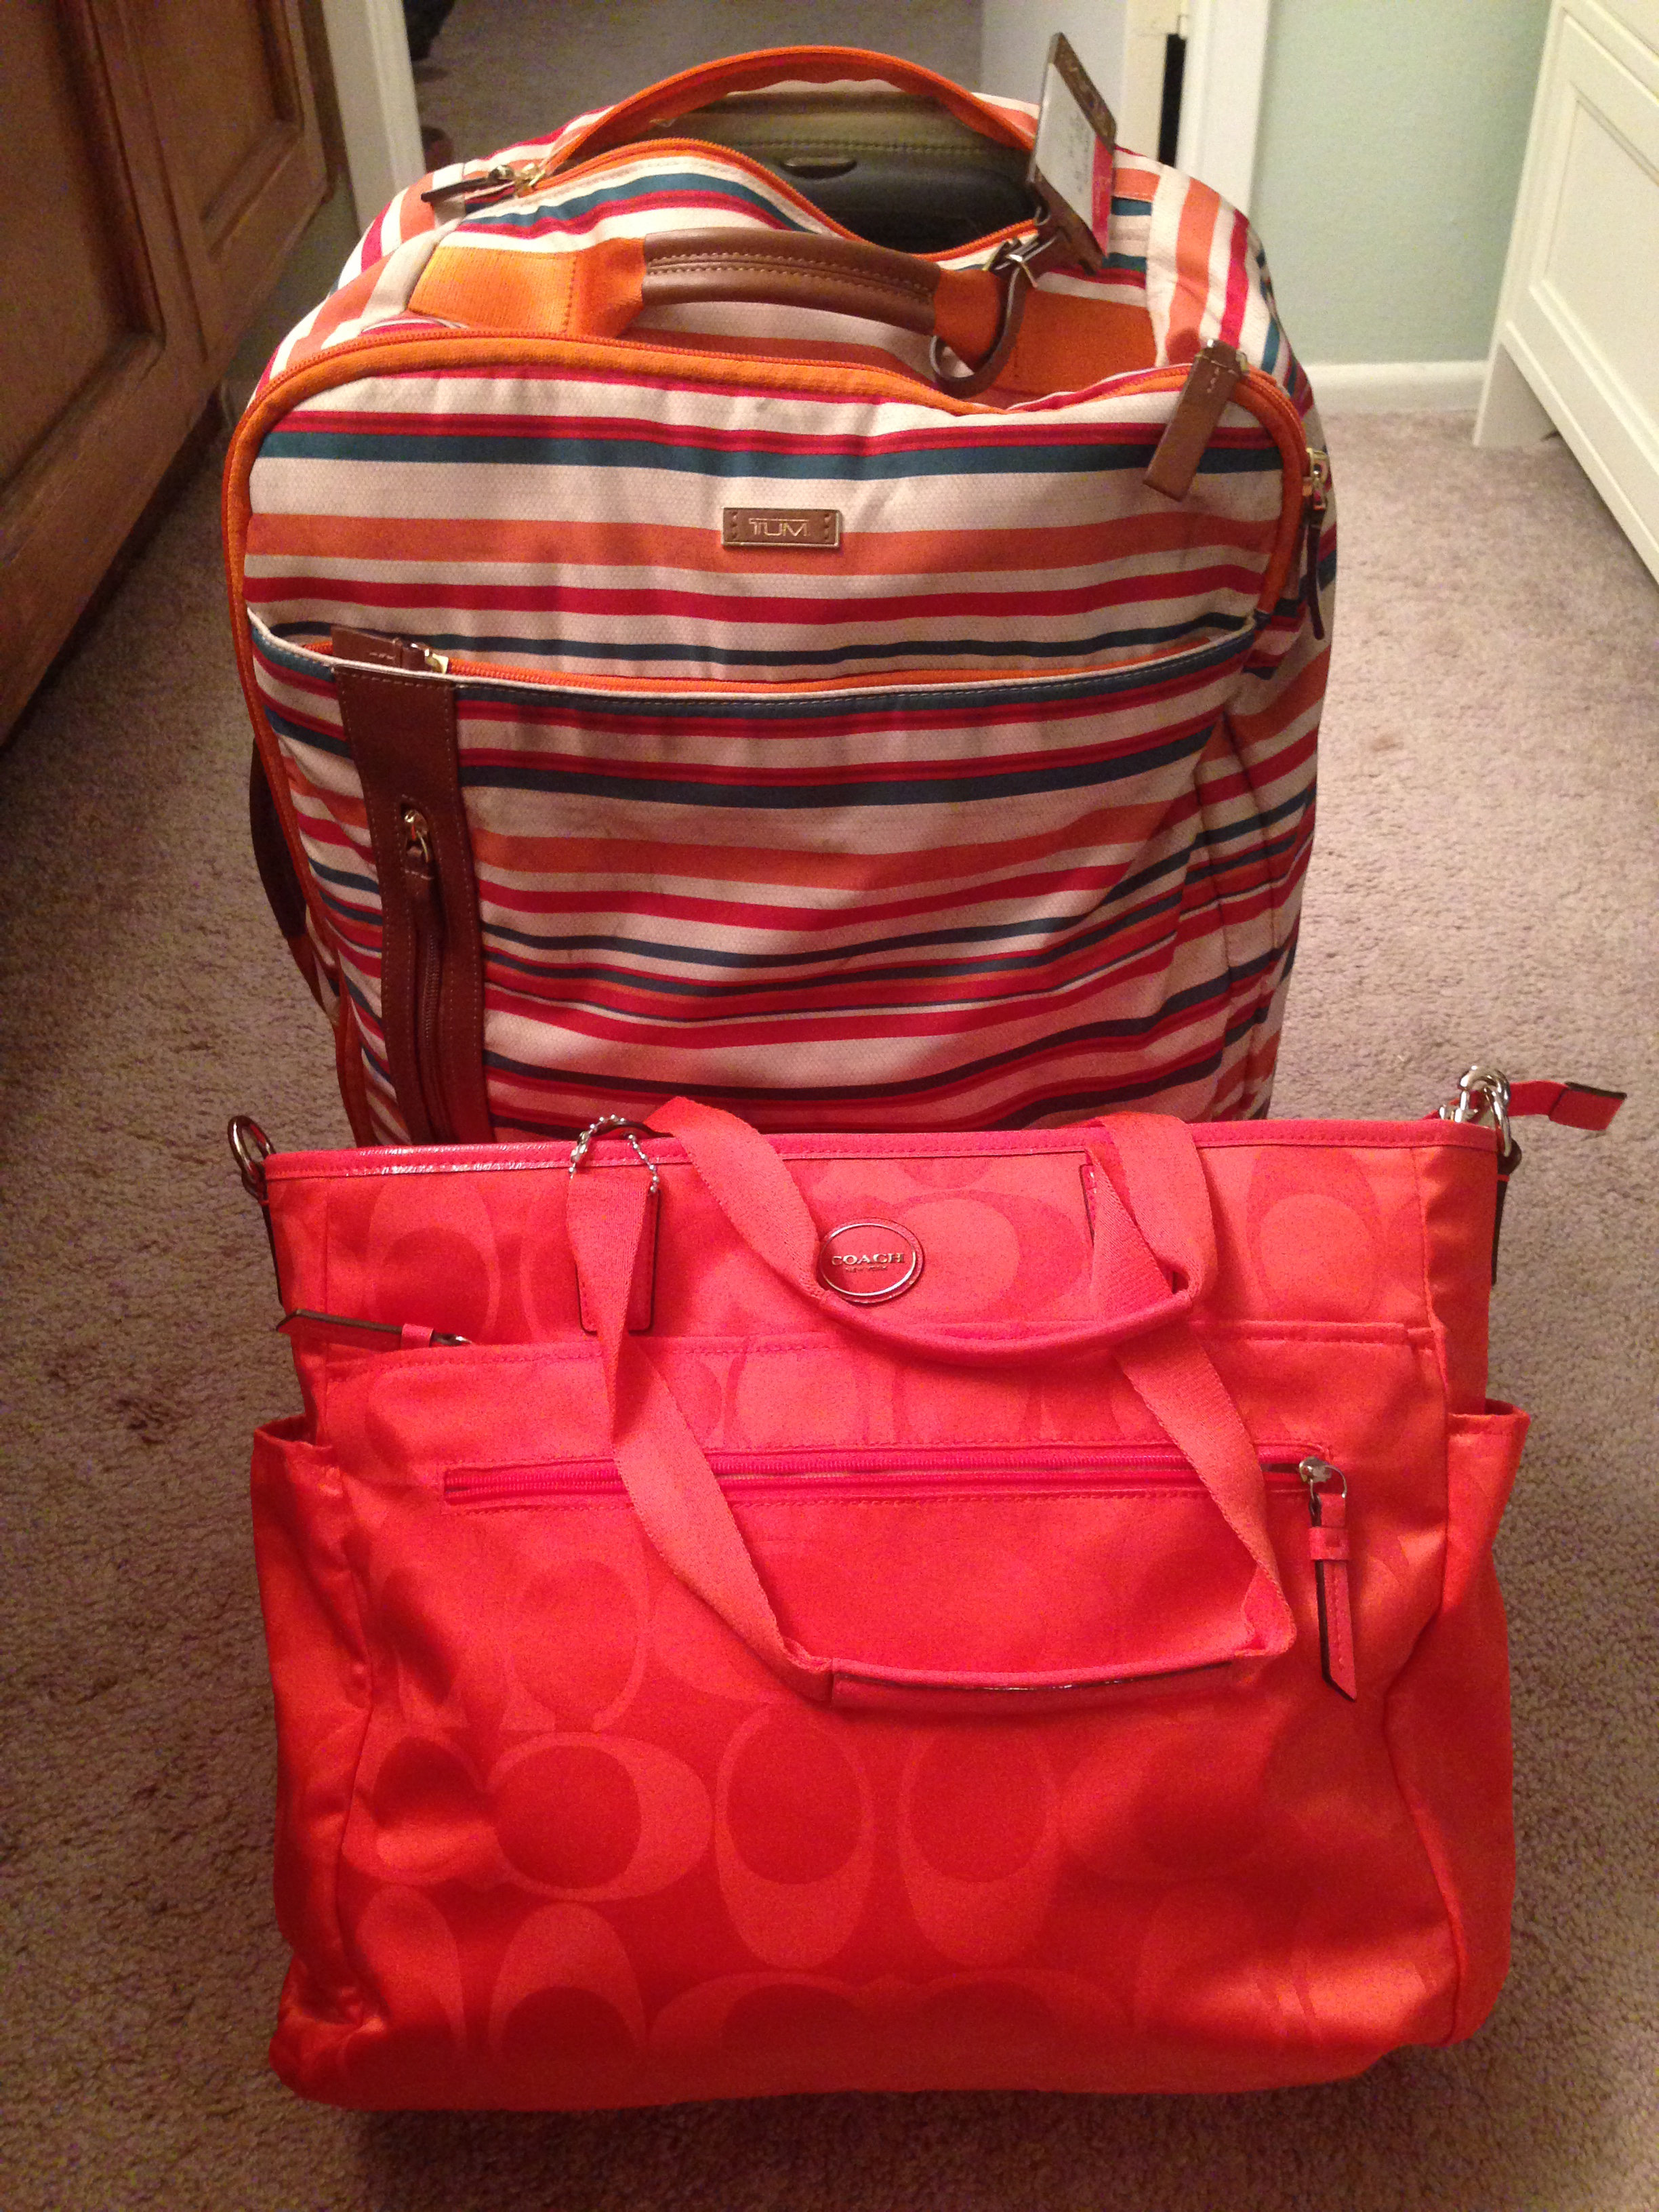 Nadine Jolie Courtney travel bags